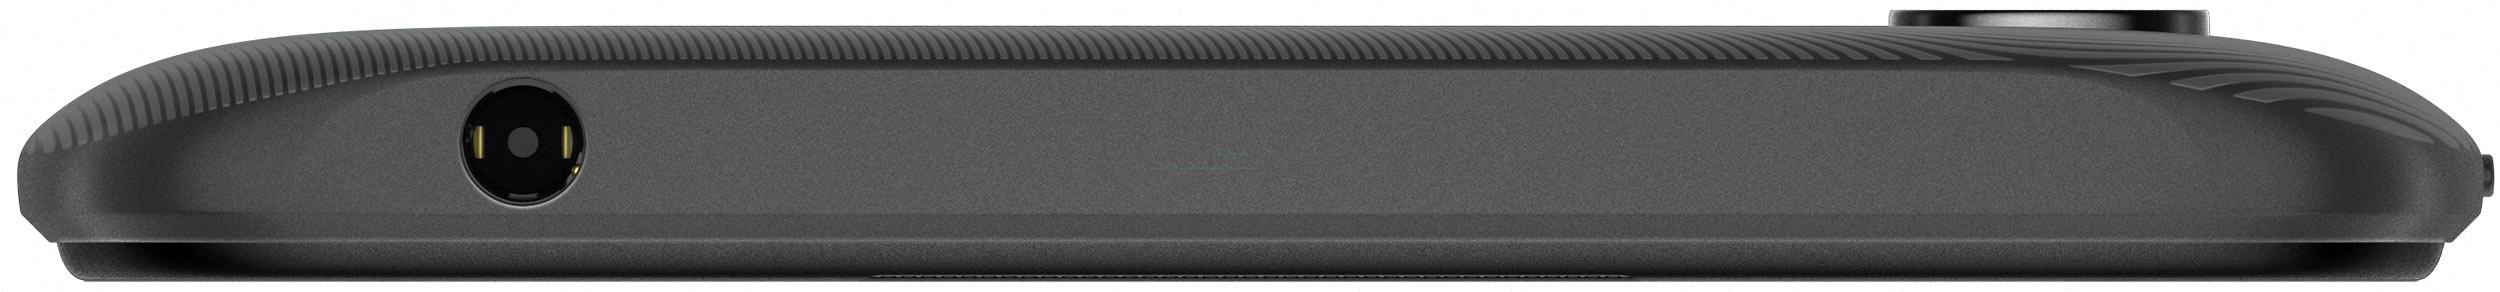 Redmi 9AT 2+32GB, Granite Gray